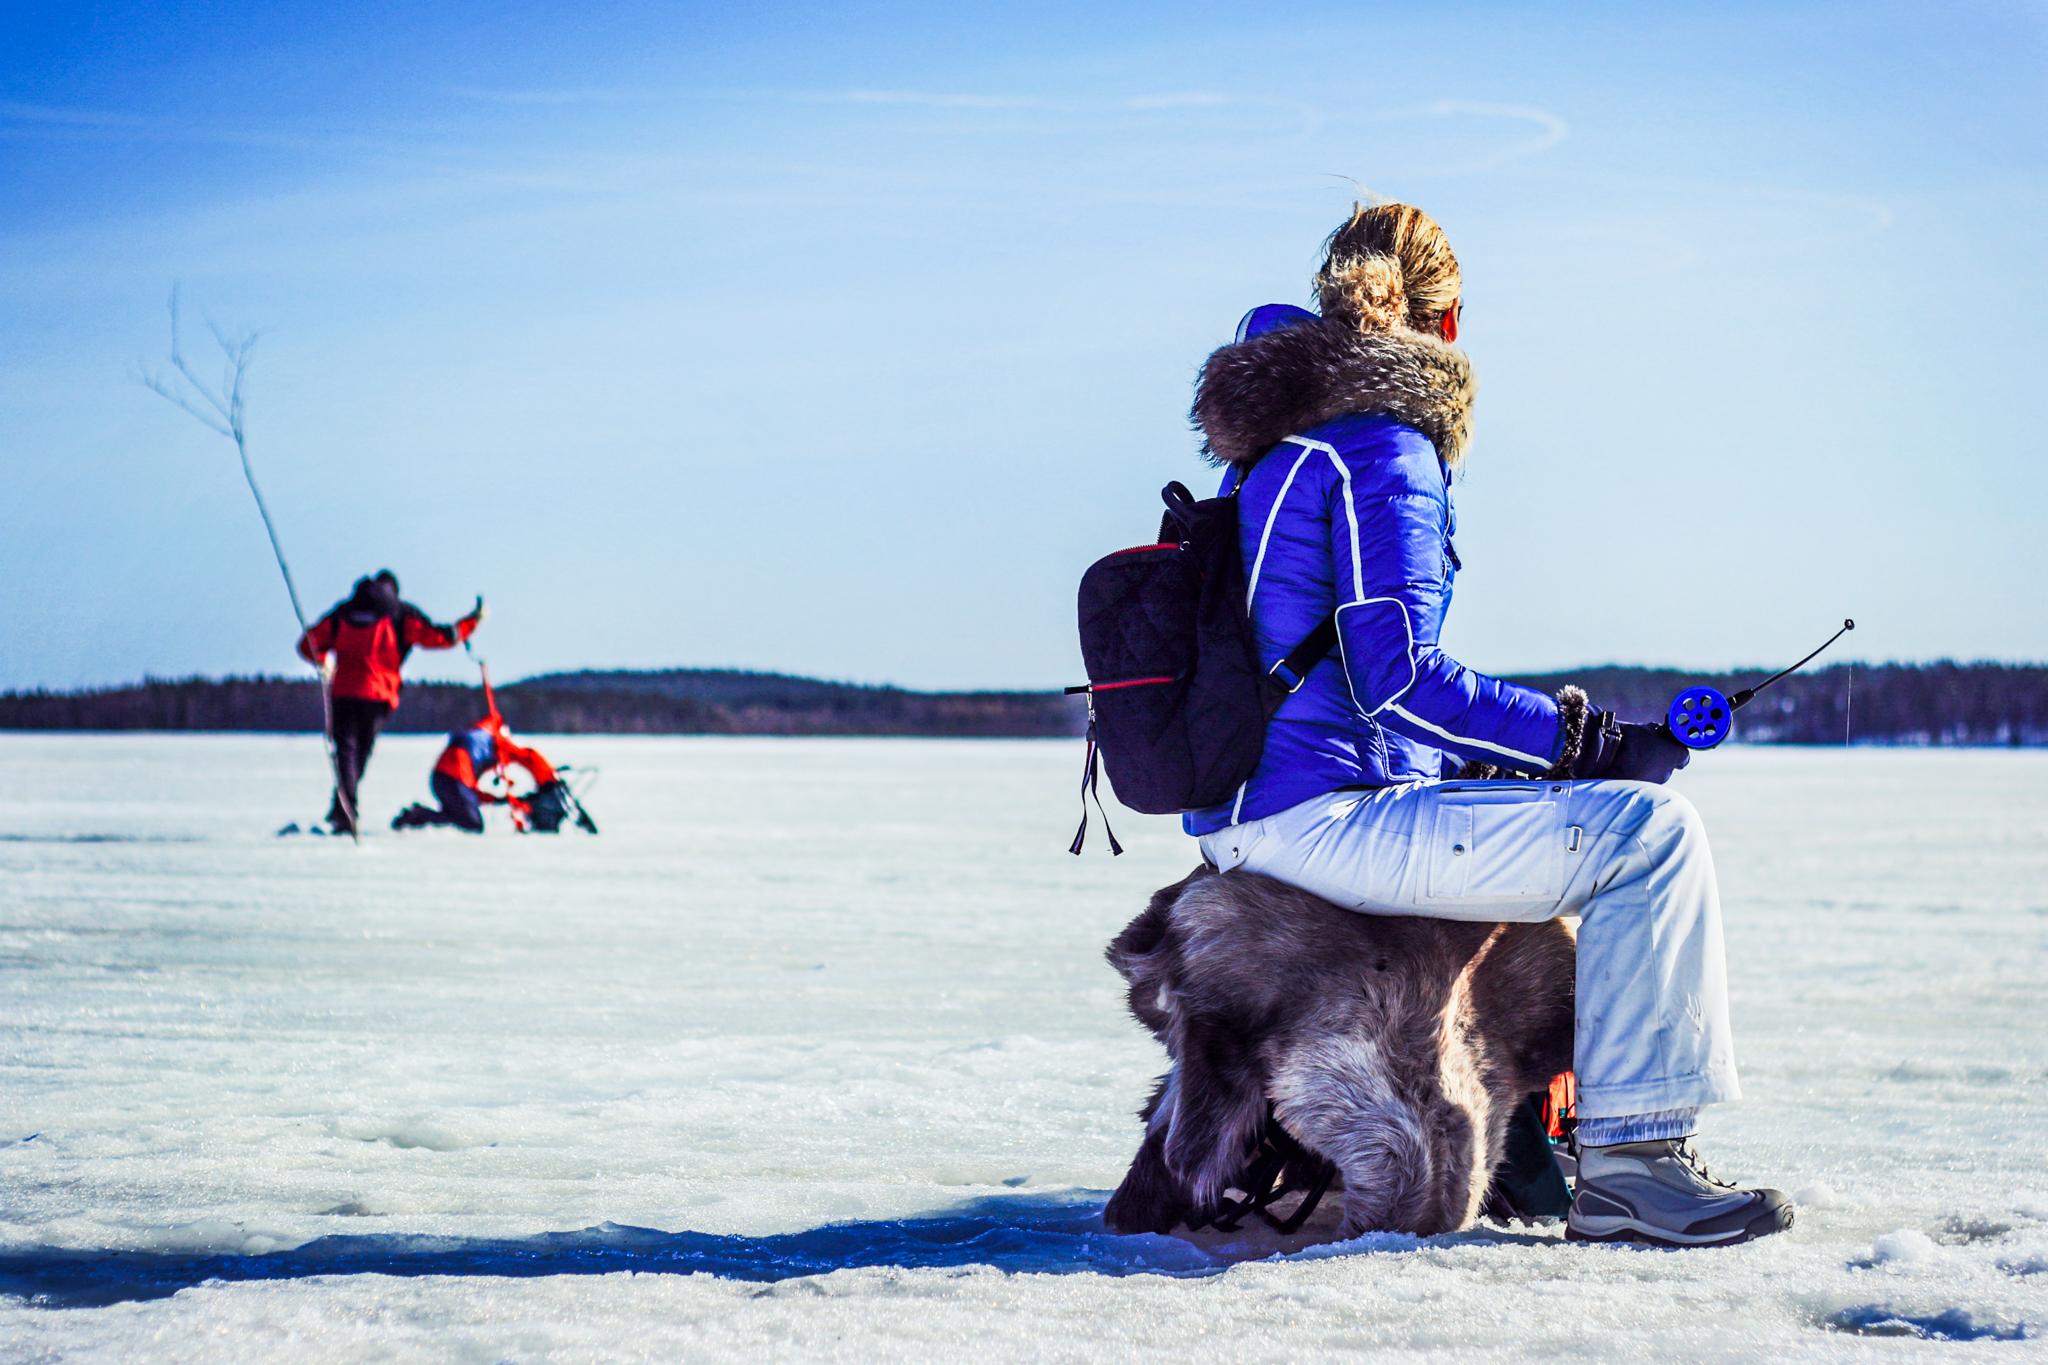 ice fishing on frozen lake